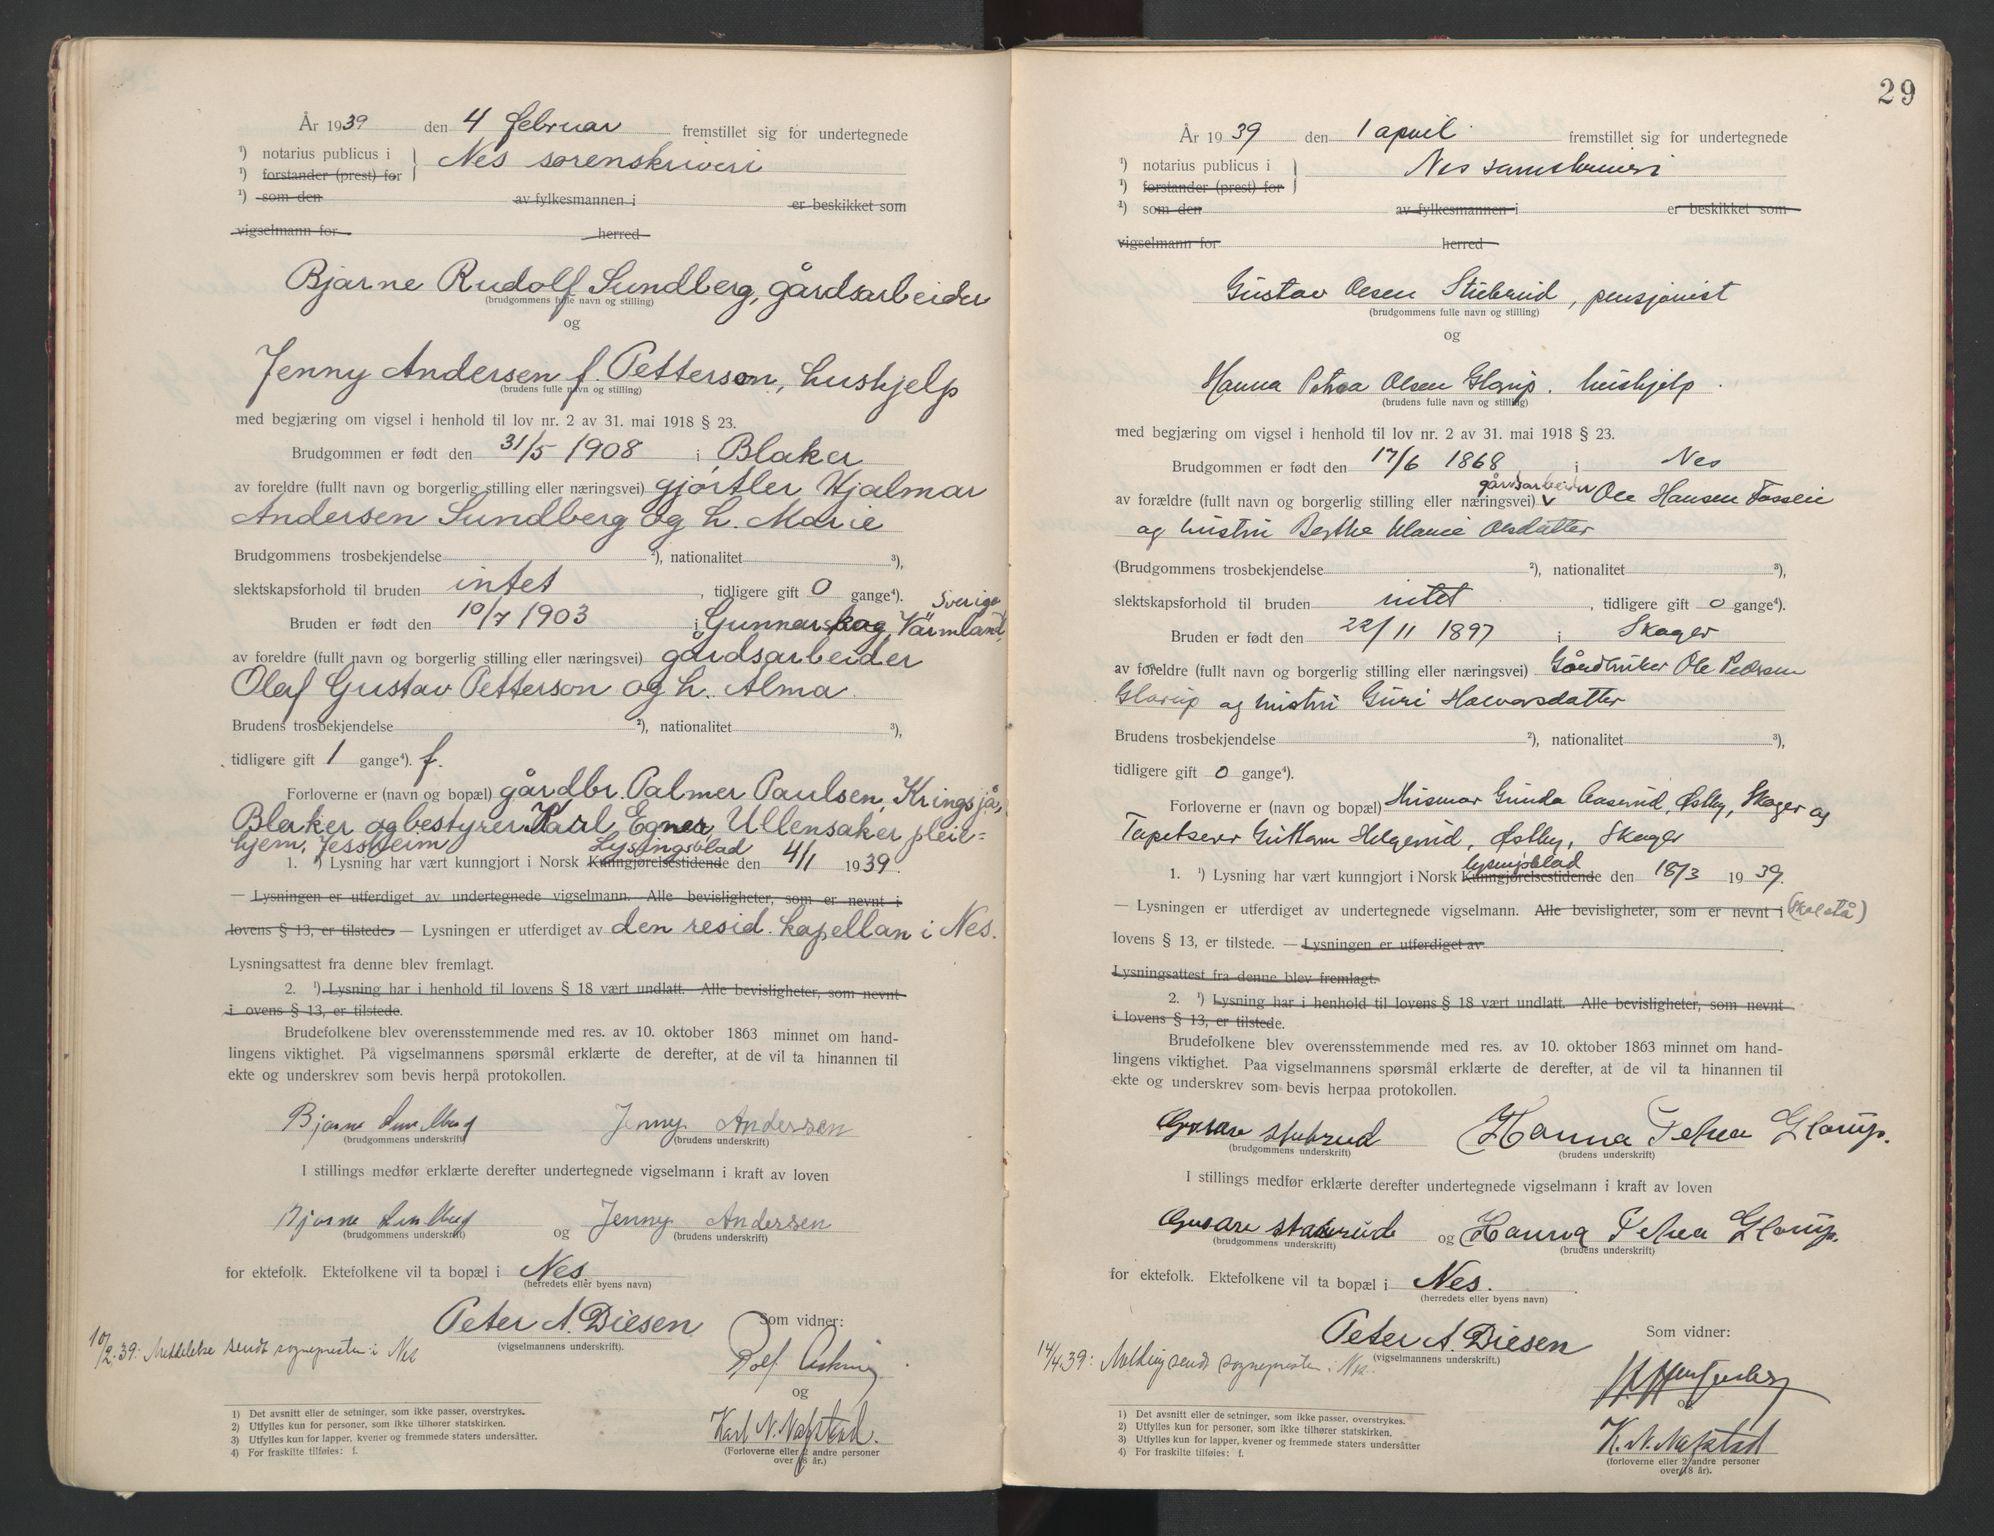 SAO, Nes tingrett, L/Lc/Lca/L0001: Vigselbok, 1920-1943, s. 29